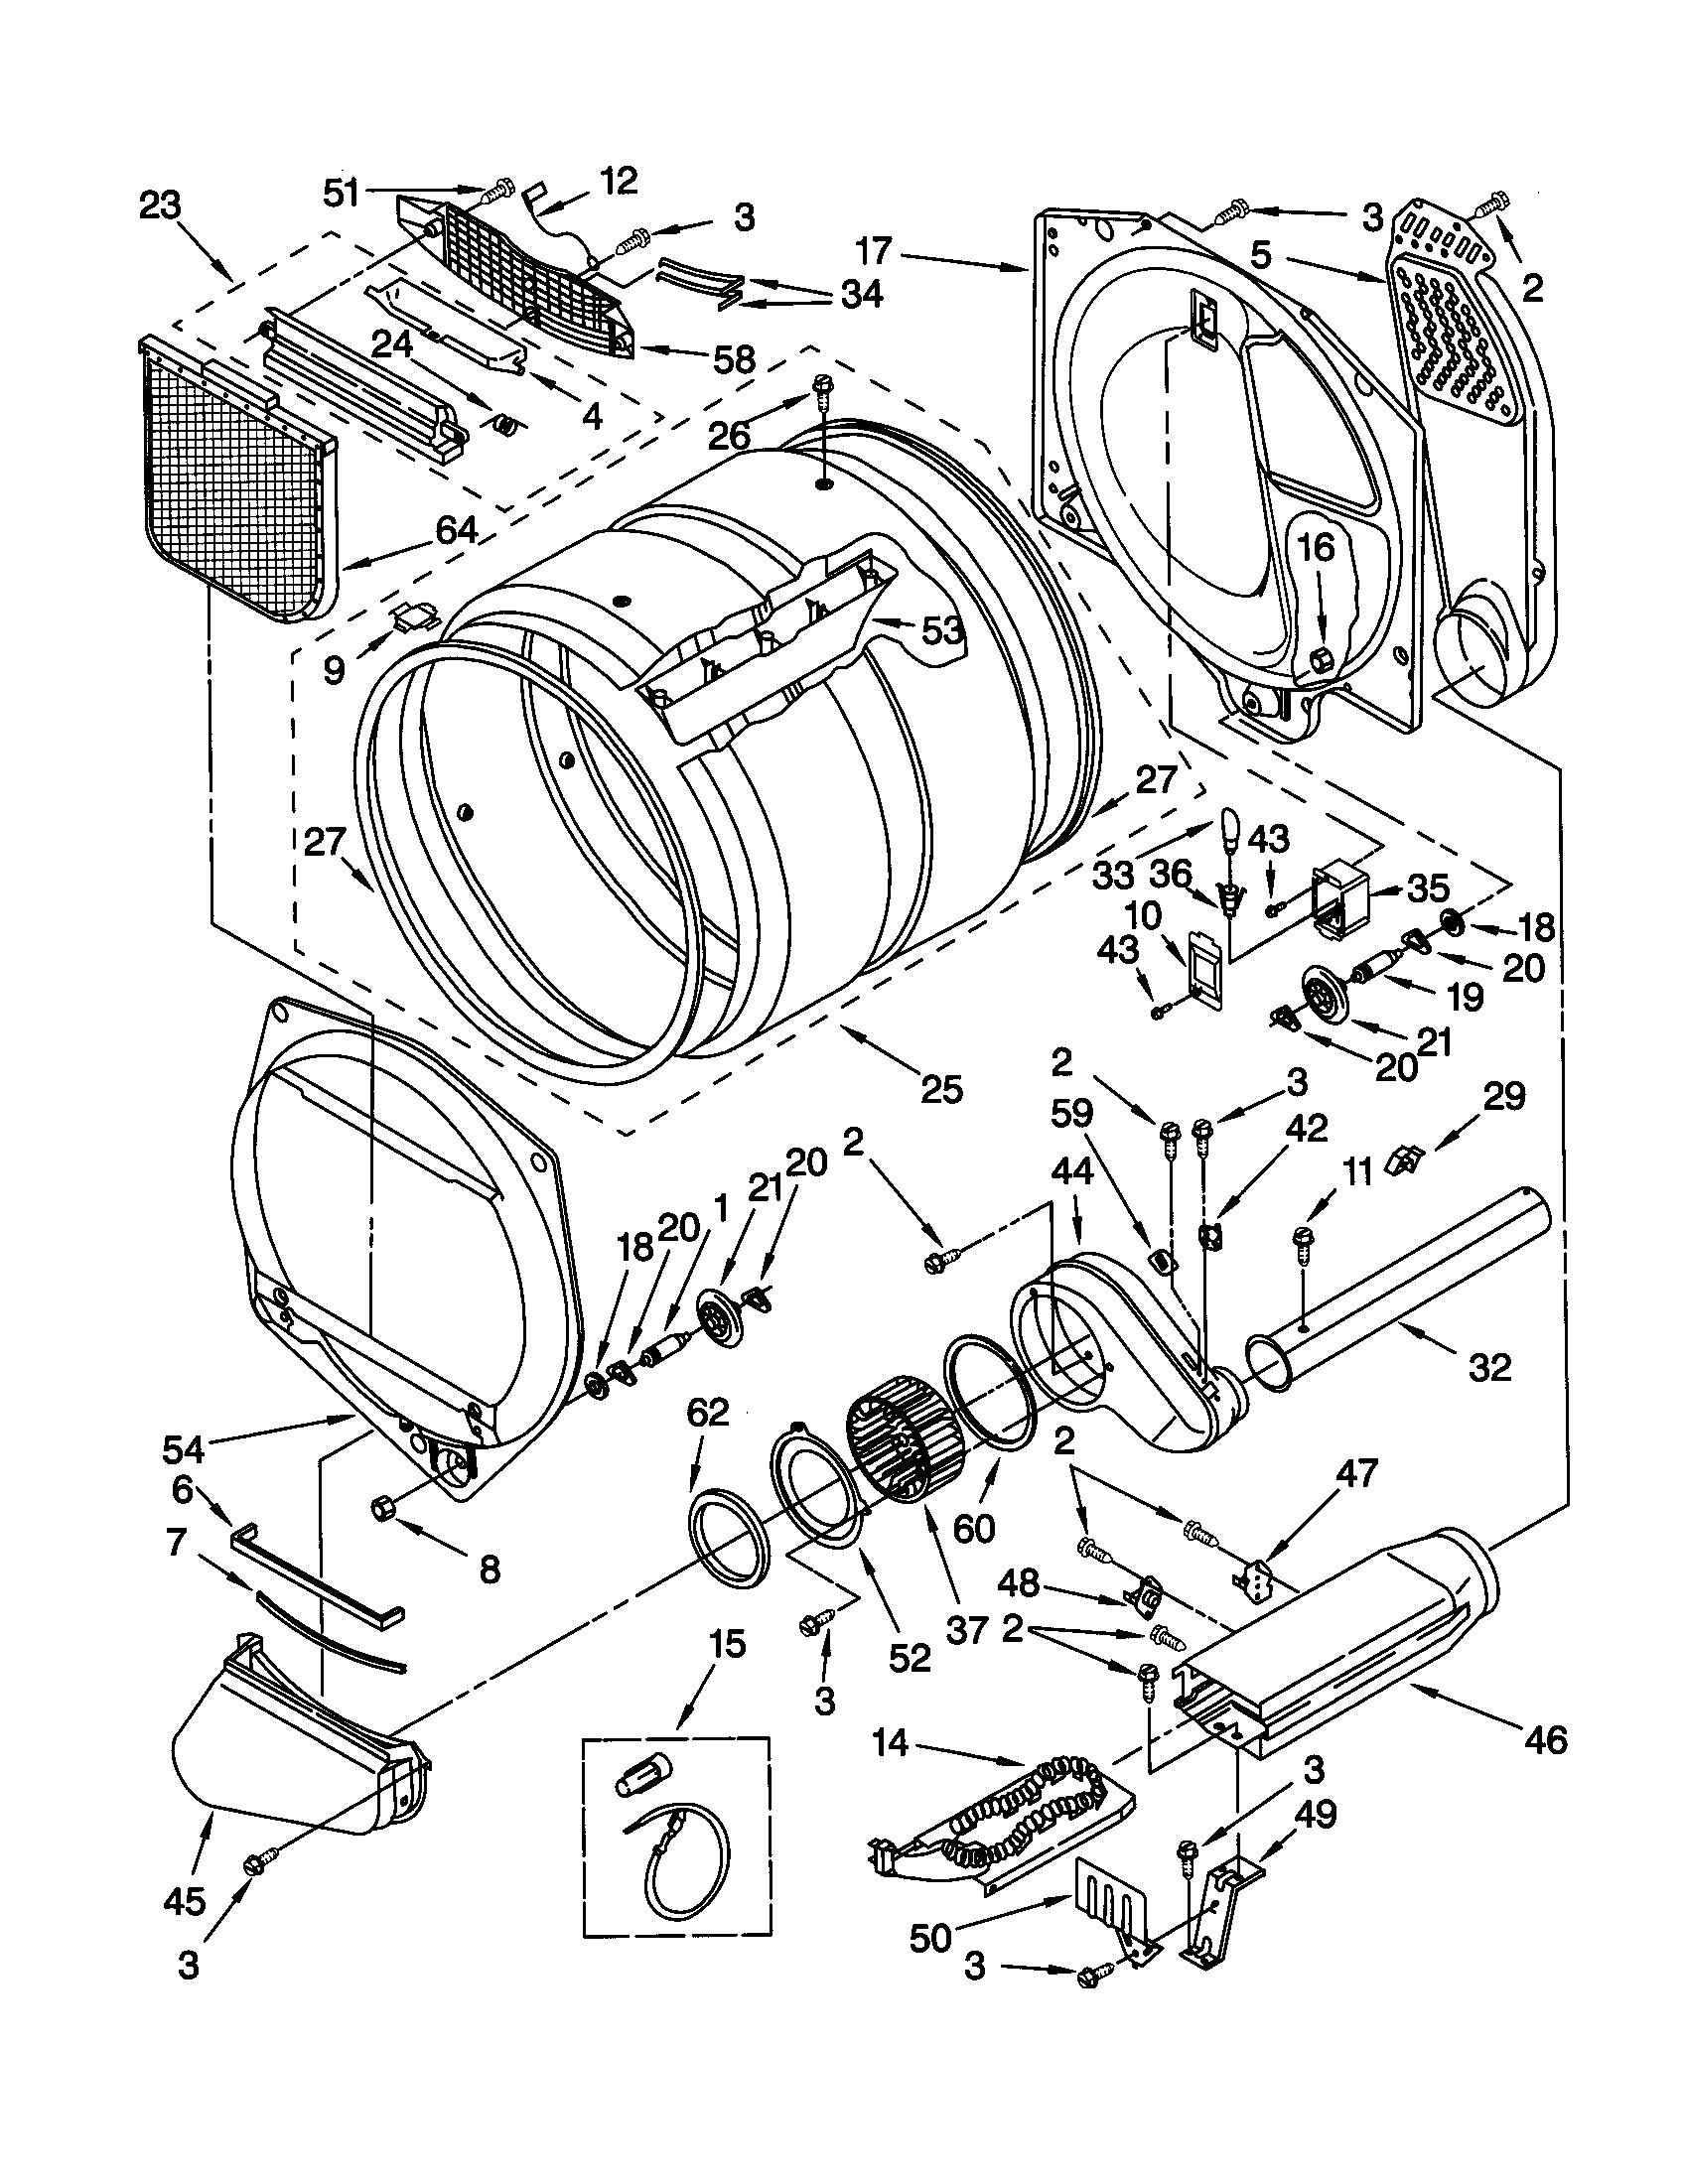 sears model 110 parts diagram pj trailer electric brake wiring kenmore 11062932100 dryer searspartsdirect